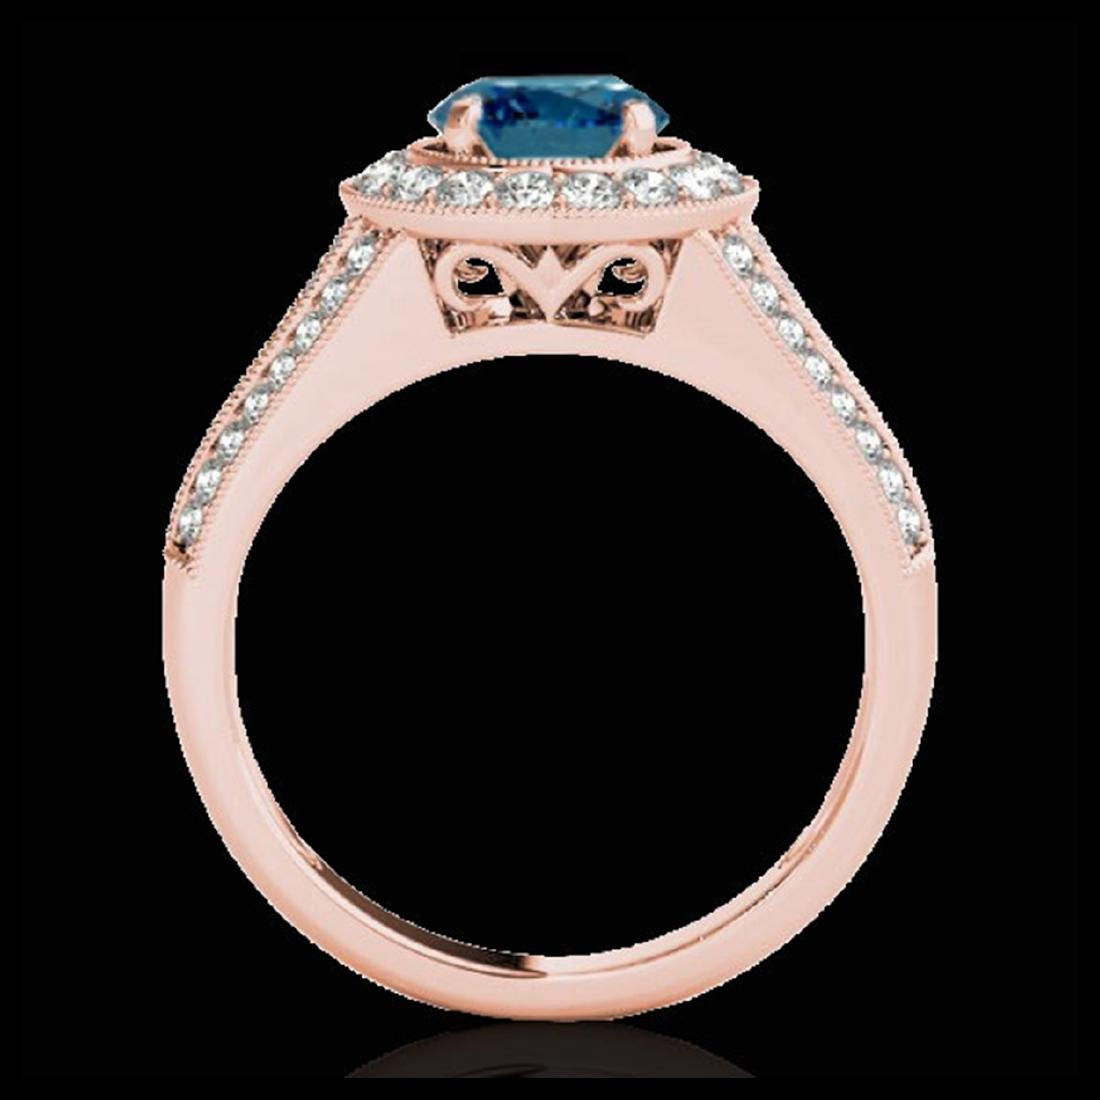 2.17 ctw SI Fancy Blue Diamond Halo Ring 10K Rose Gold - 2